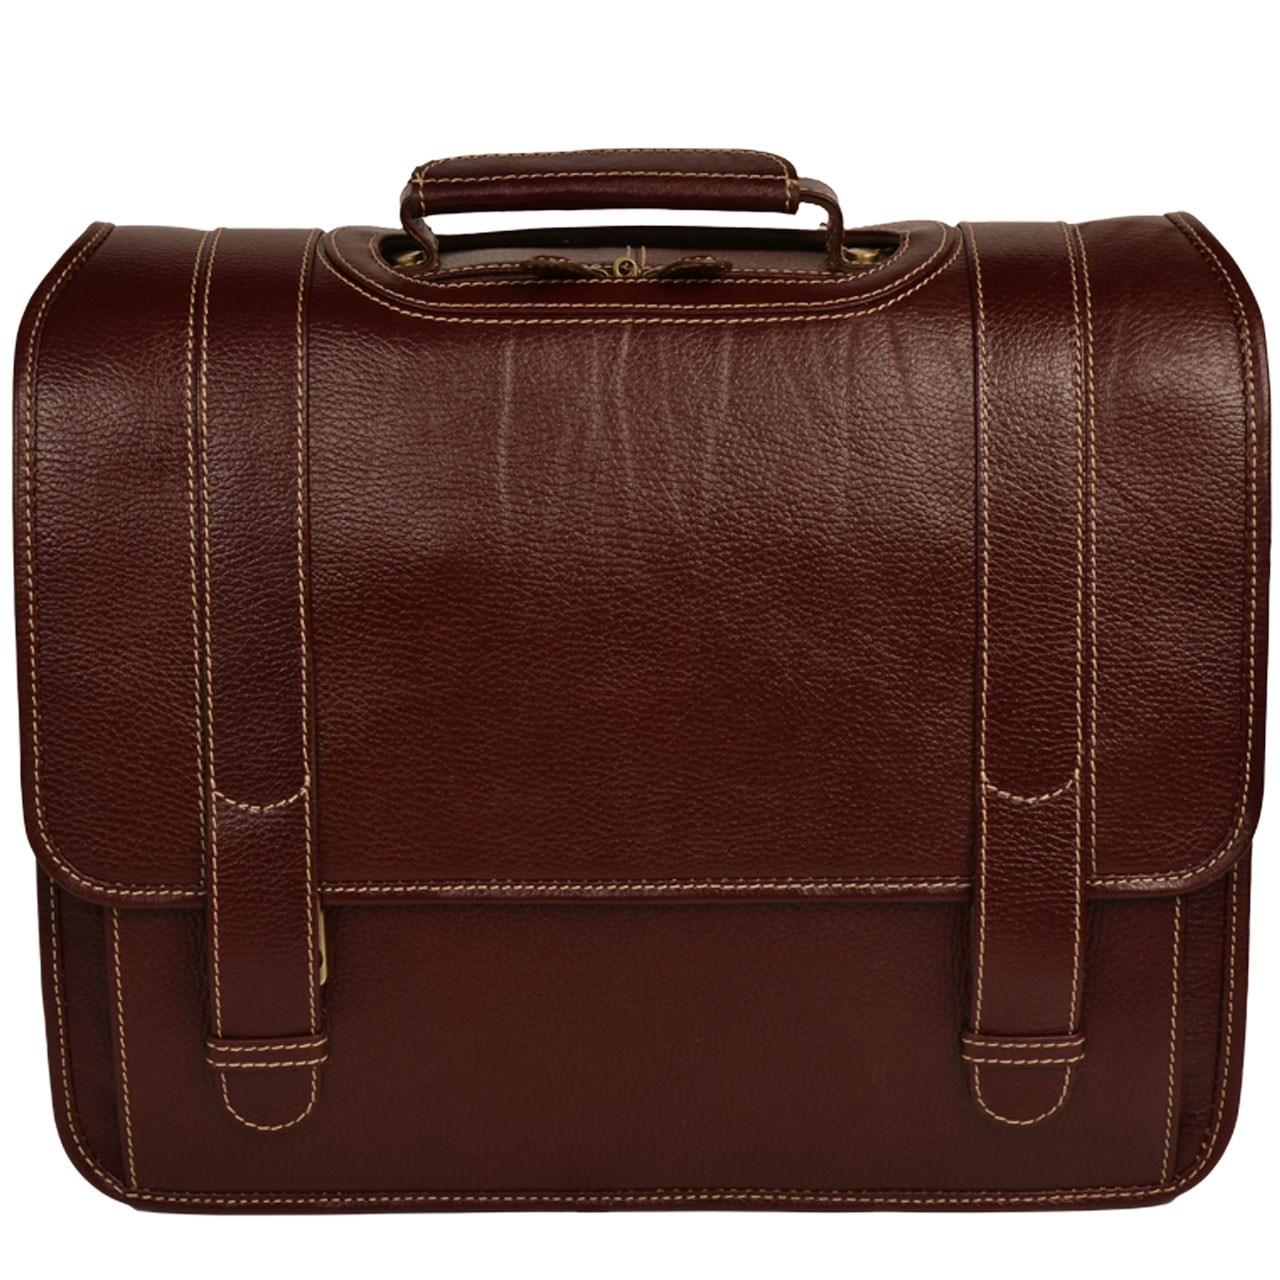 کیف اداری چرم طبیعی کهن چرم مدل LT1-12